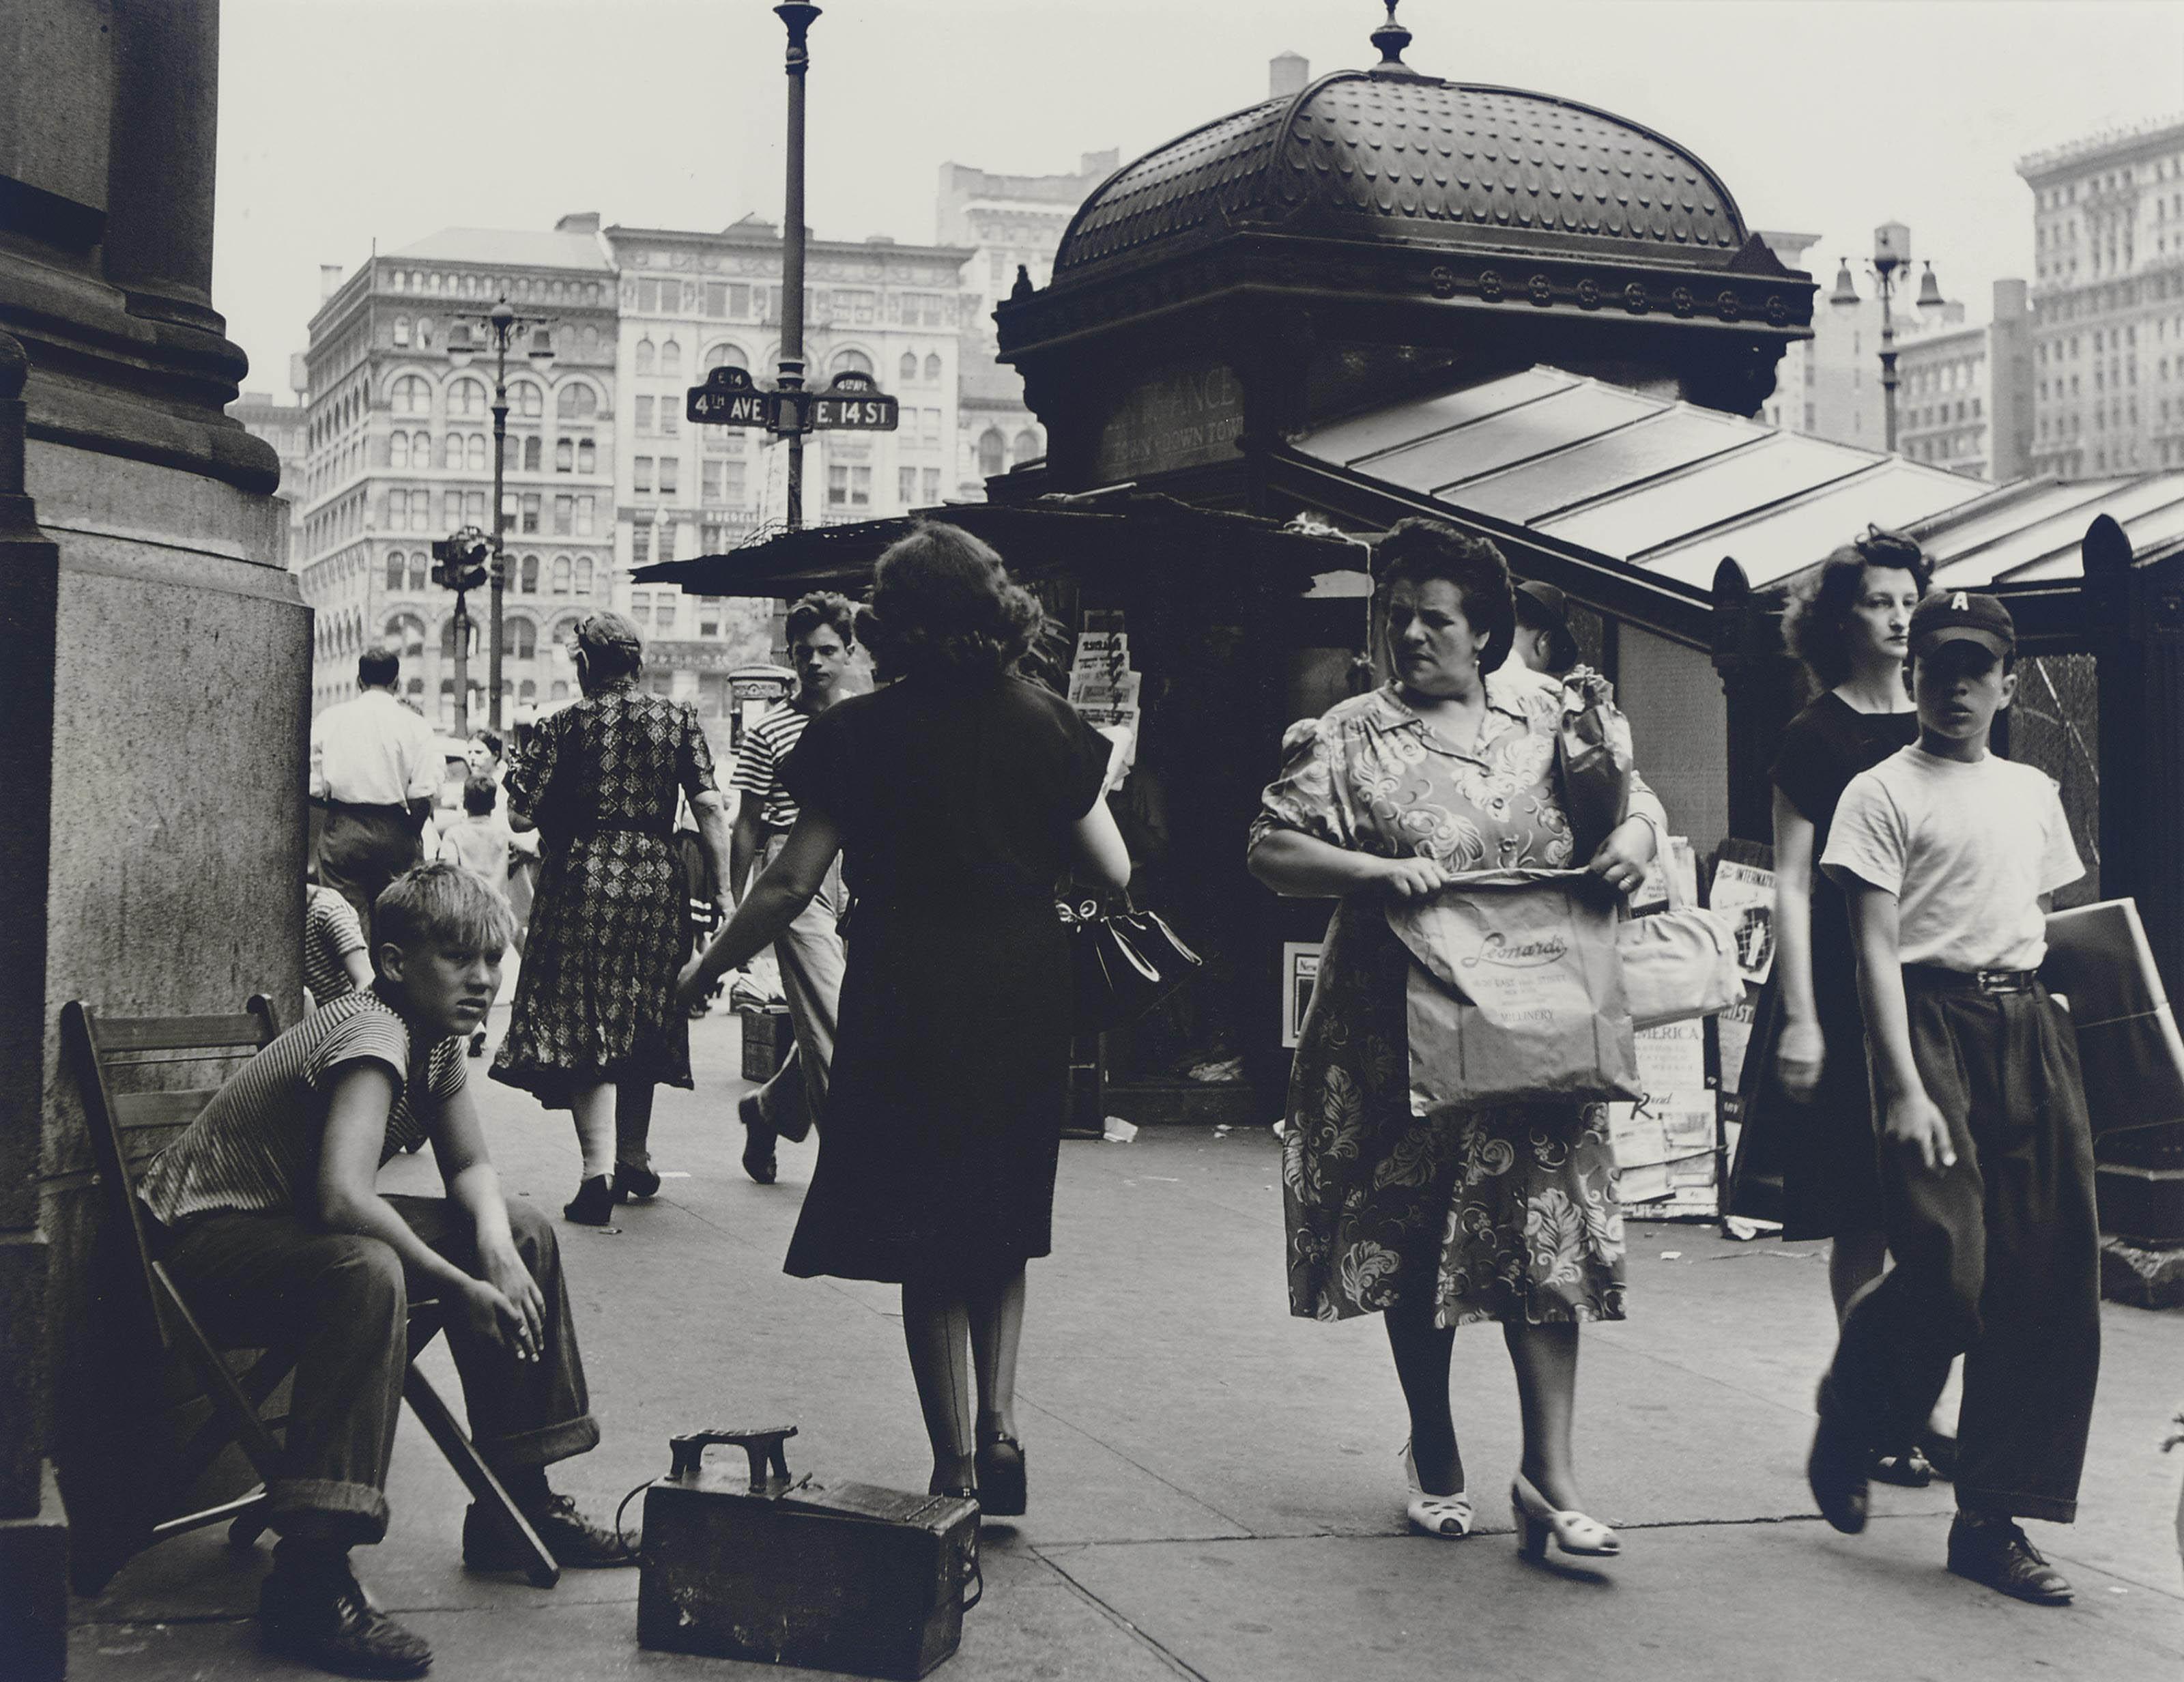 Shoe Shines, New York City, 1945-1948